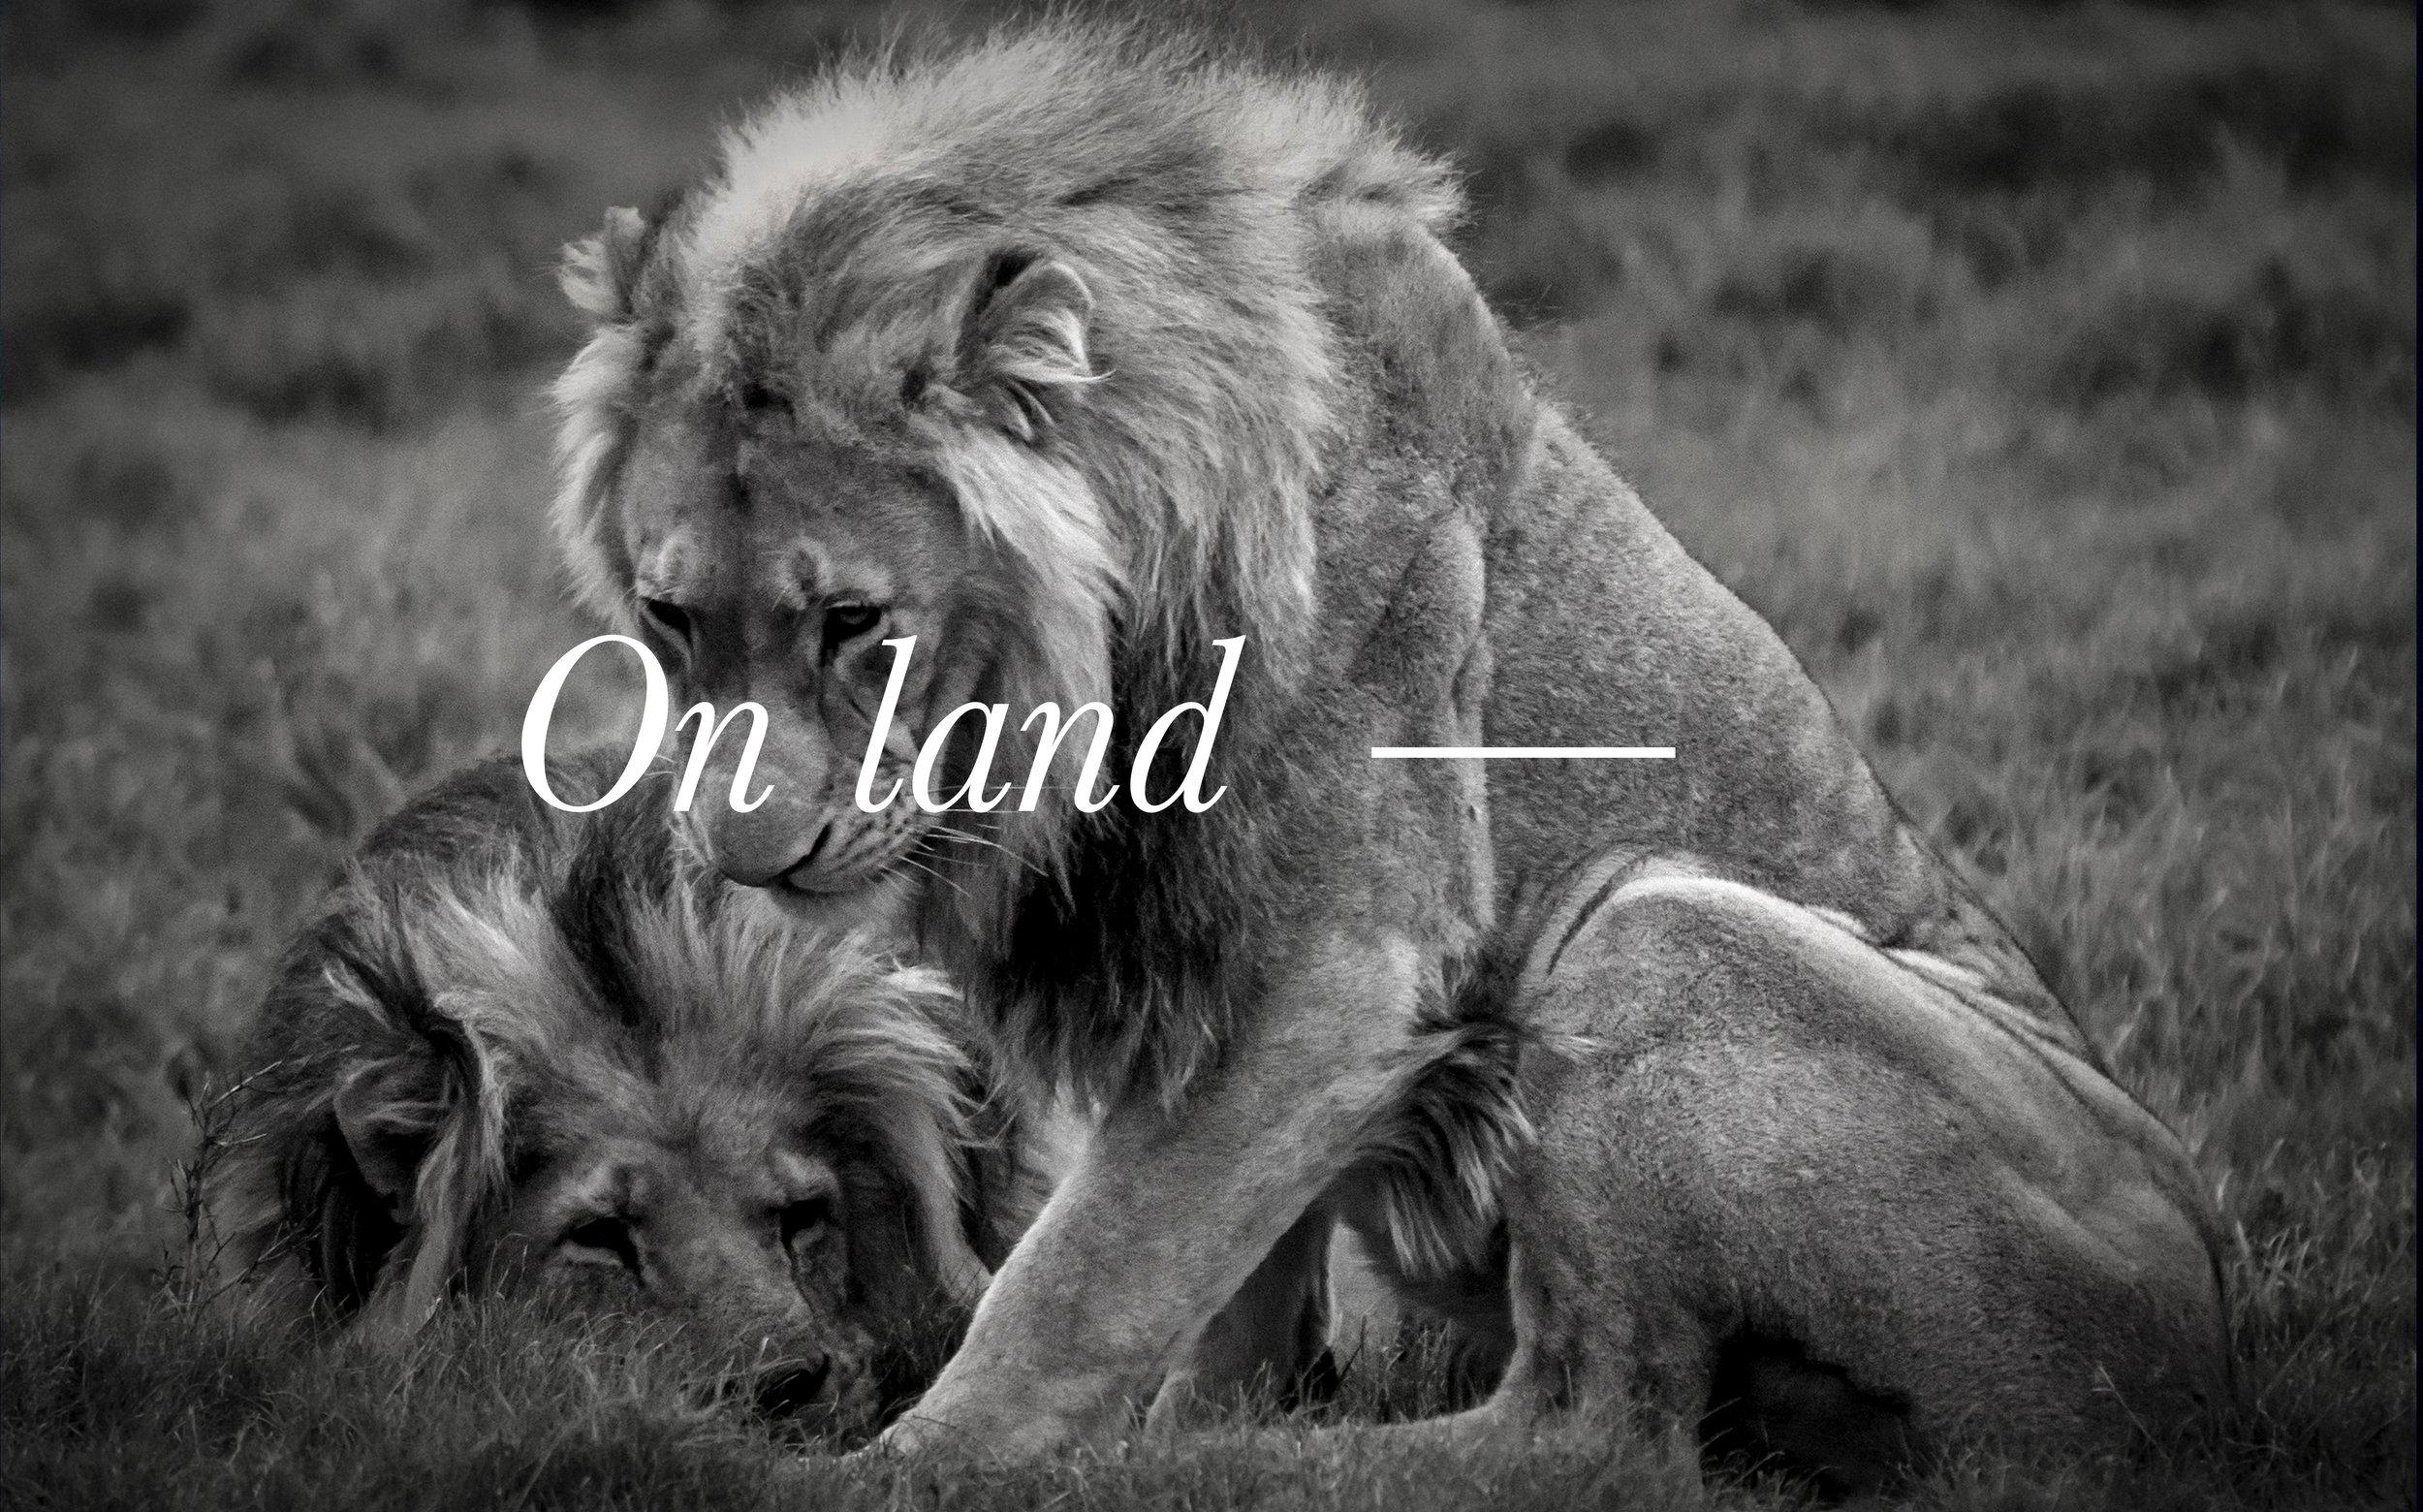 On land2.jpg